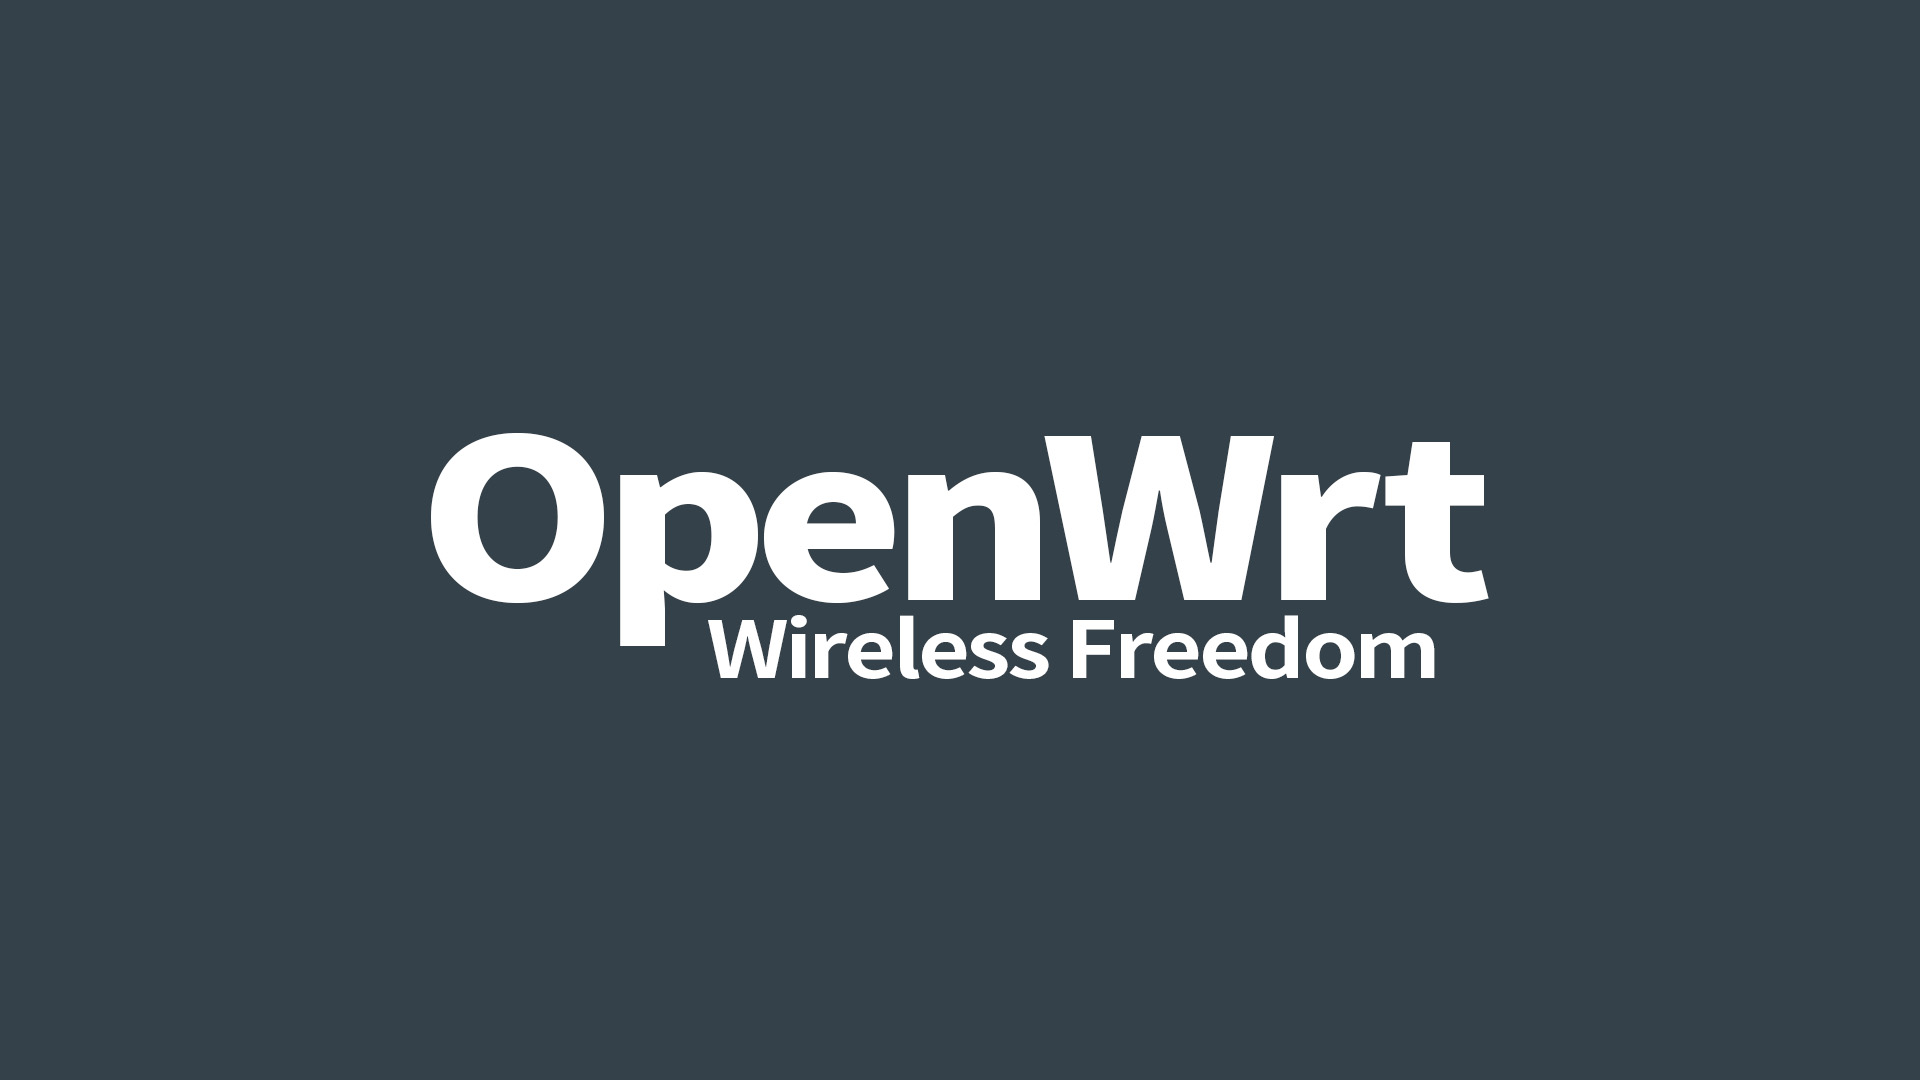 【openwrt】使用LEDE自带的动态DNS进行动态域名解析